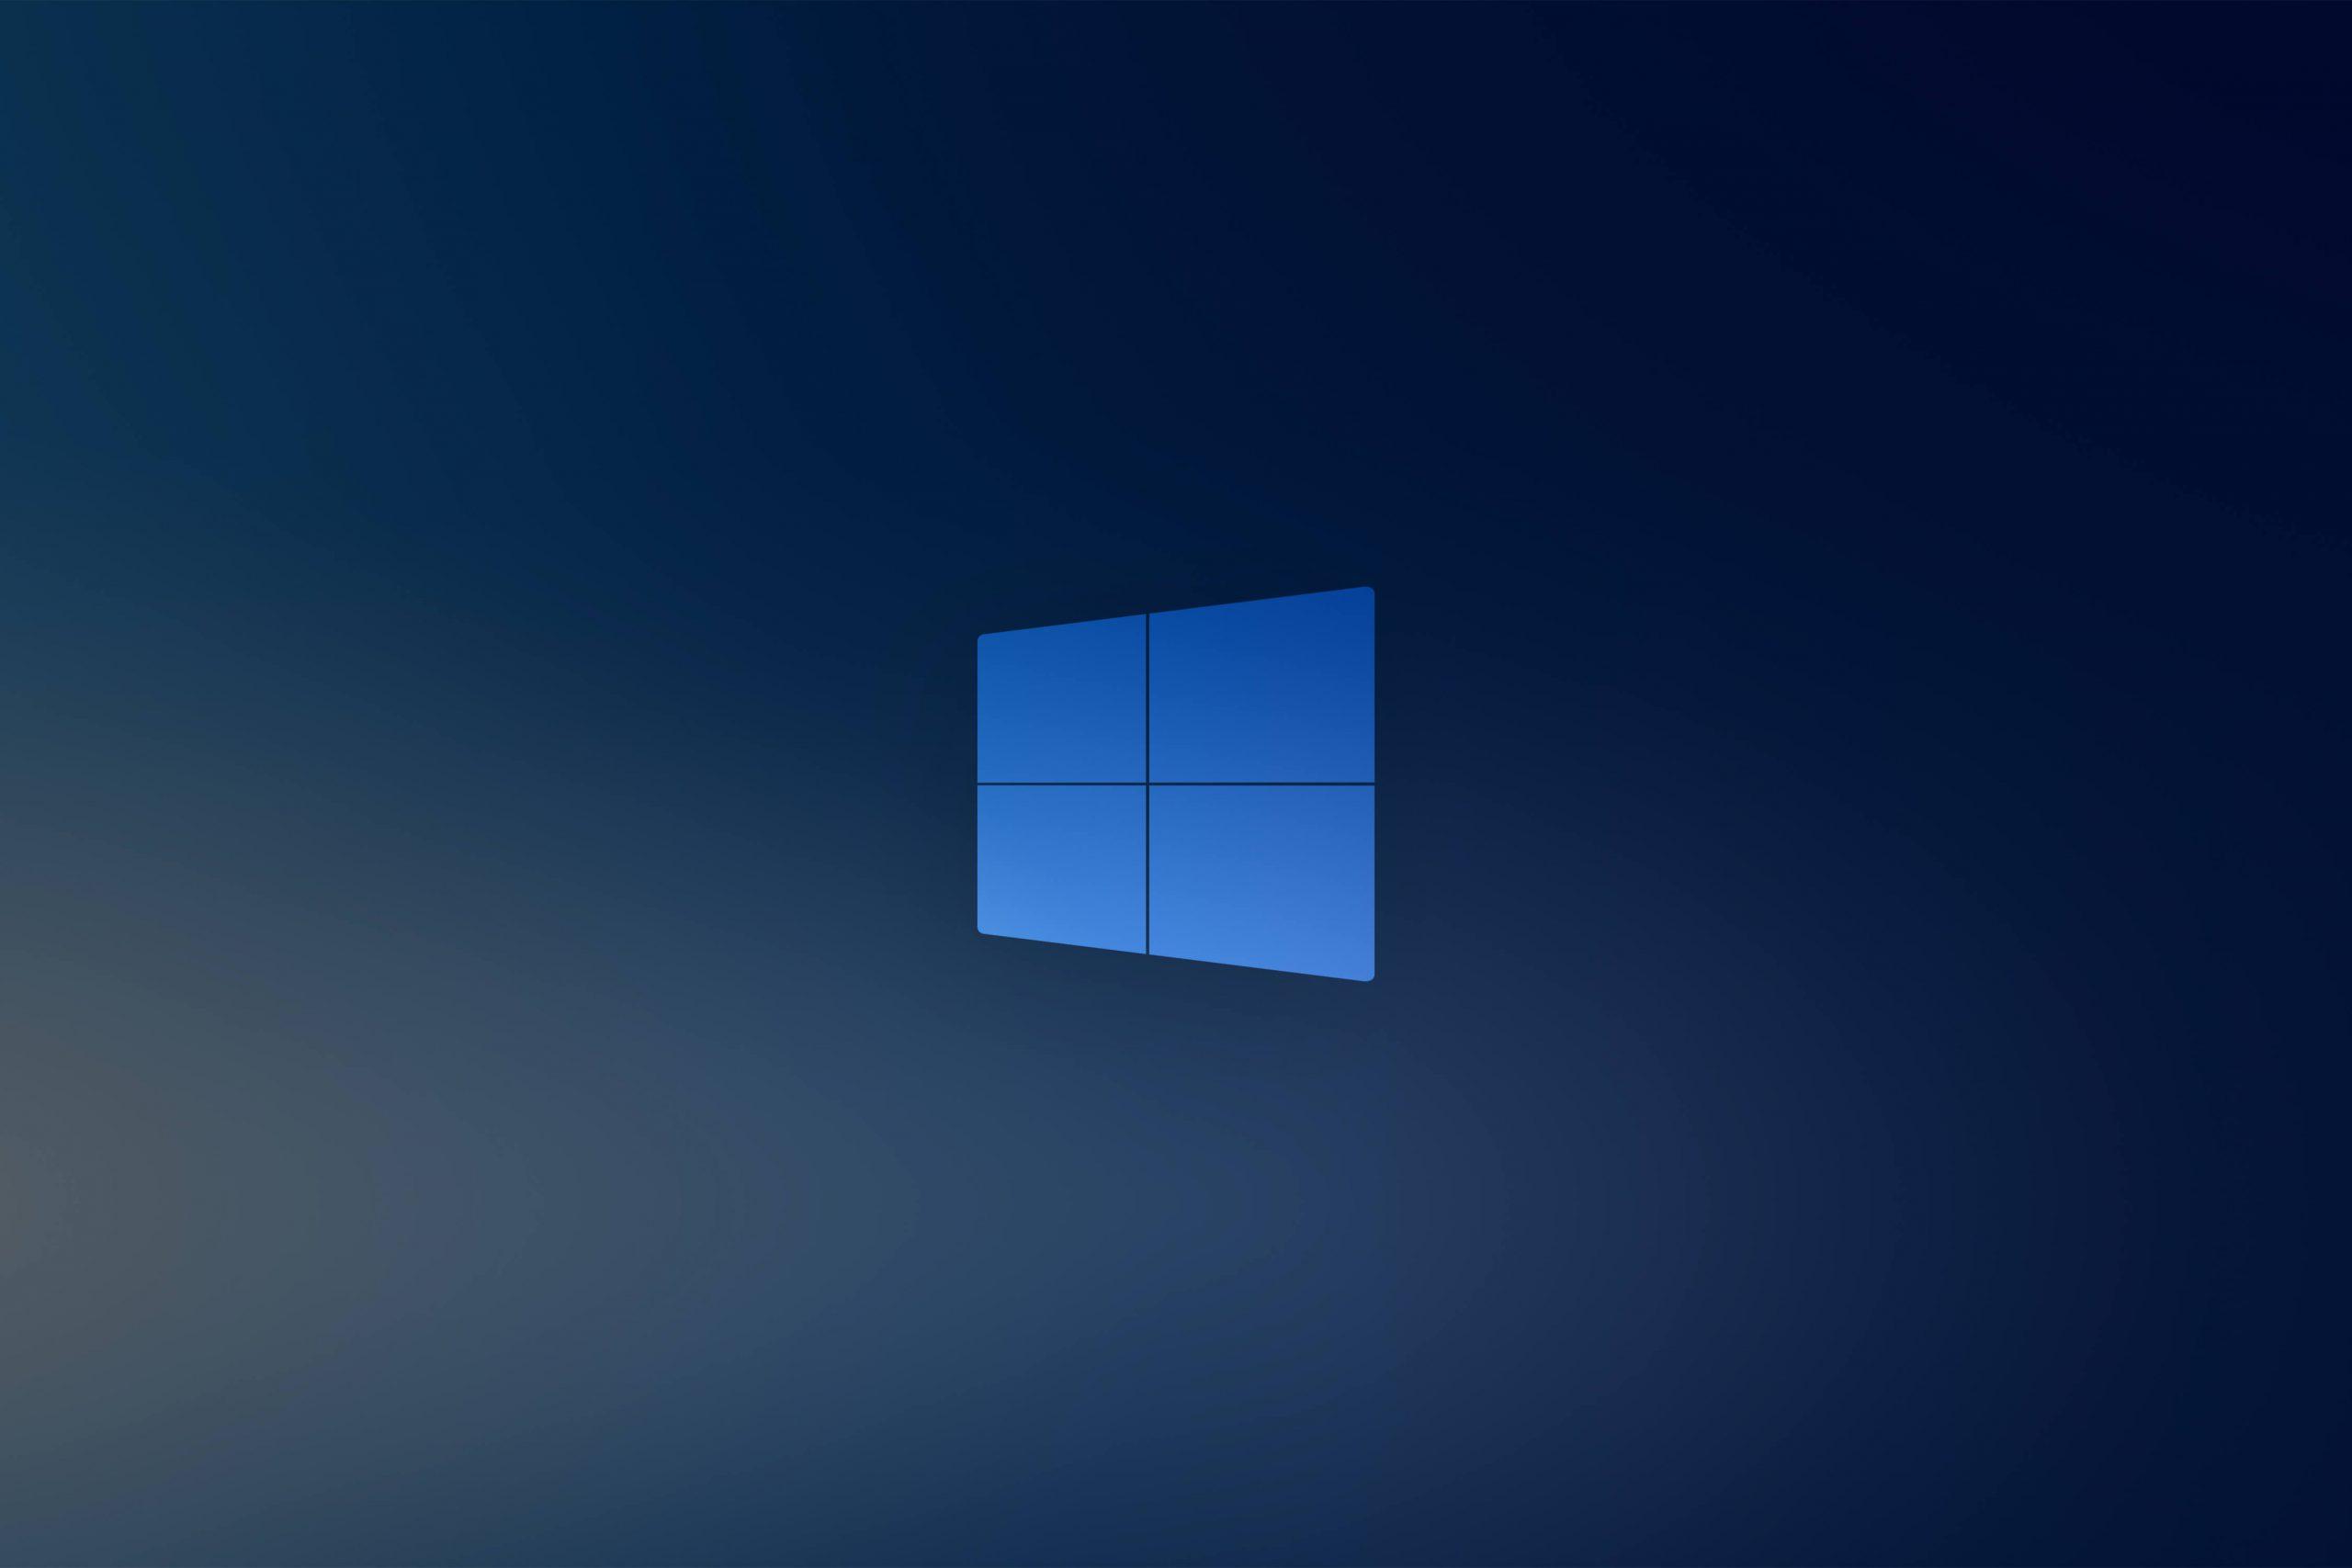 Windows 10x Wallpaper